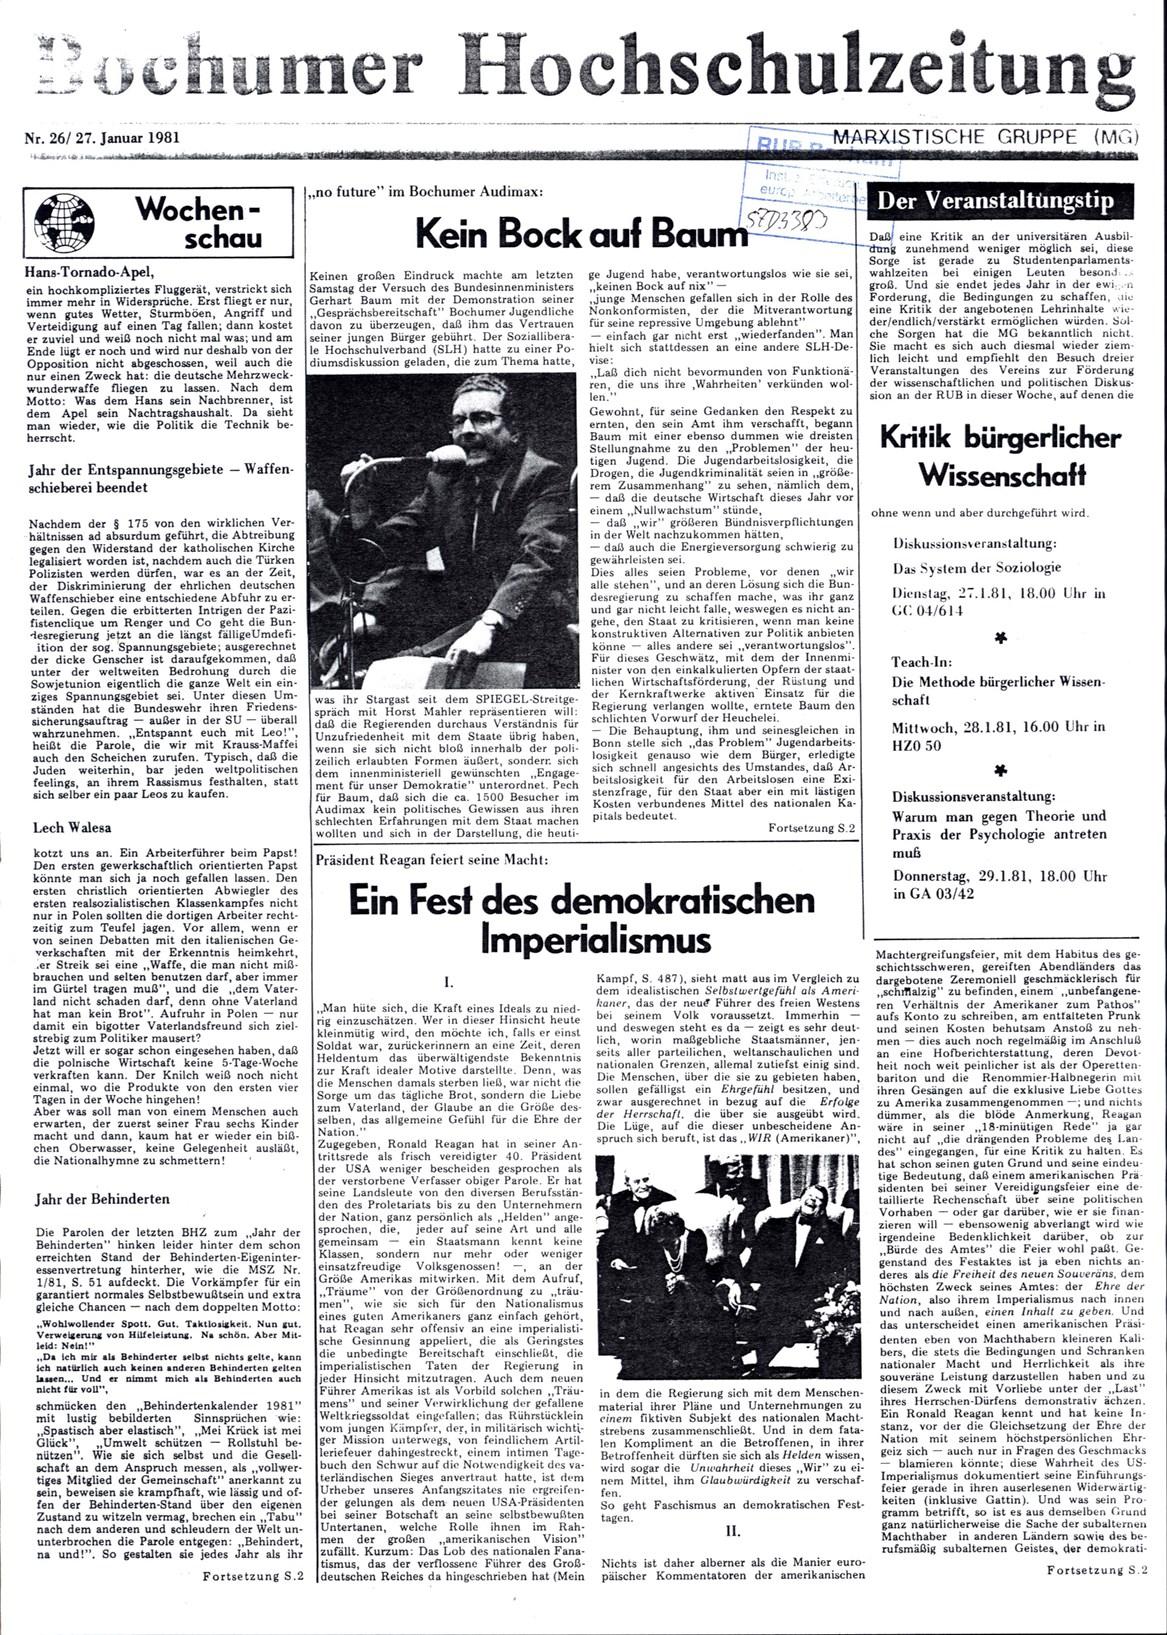 Bochum_BHZ_19810127_026_001